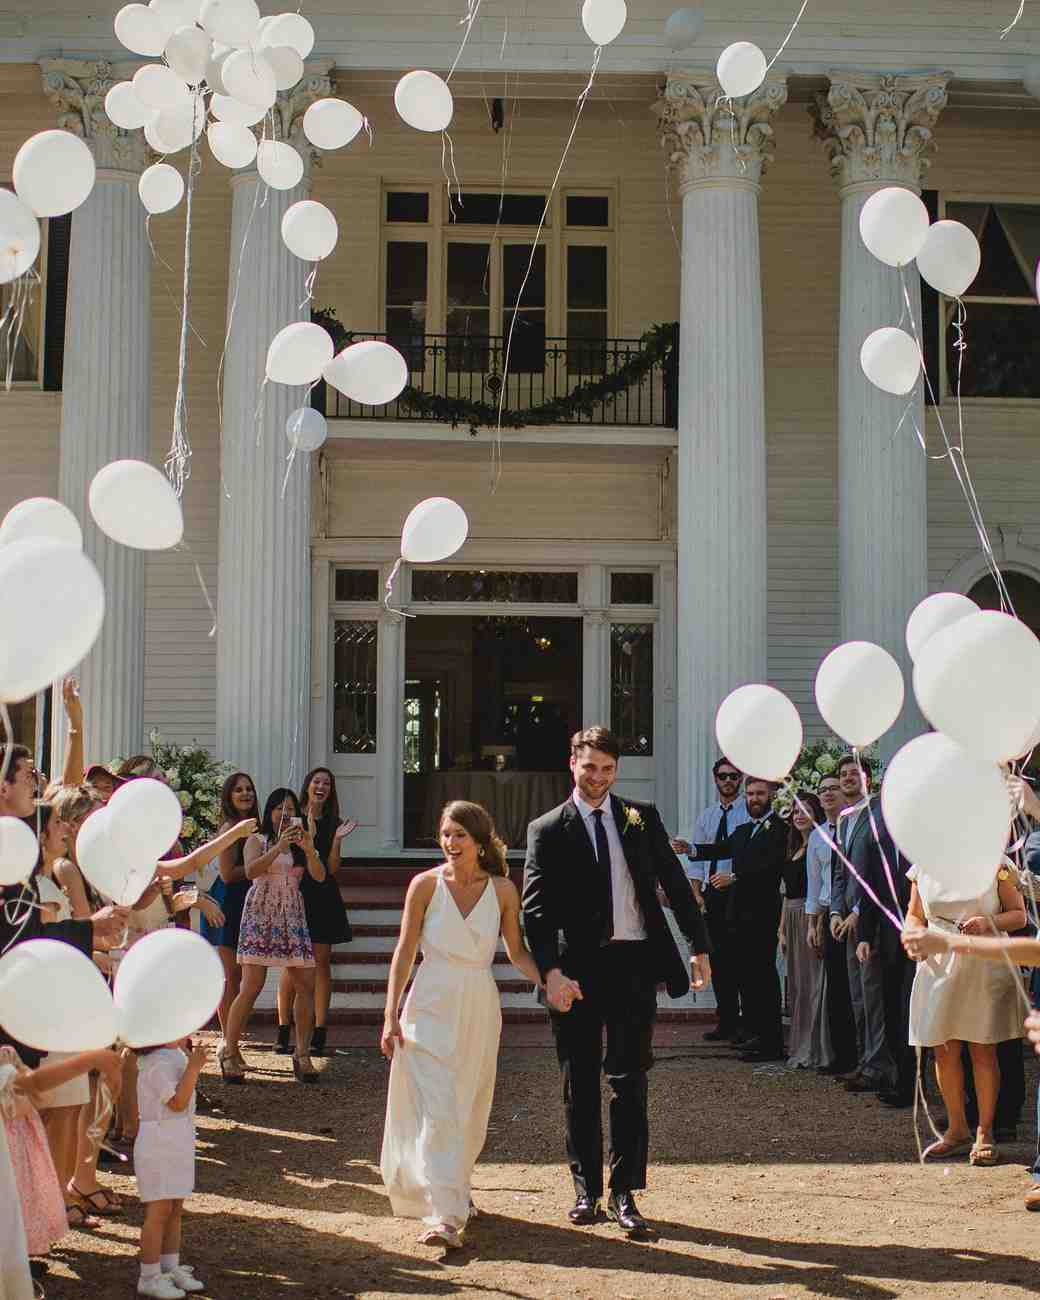 wedding-brunch-ideas-balloon-exit-0416.jpg